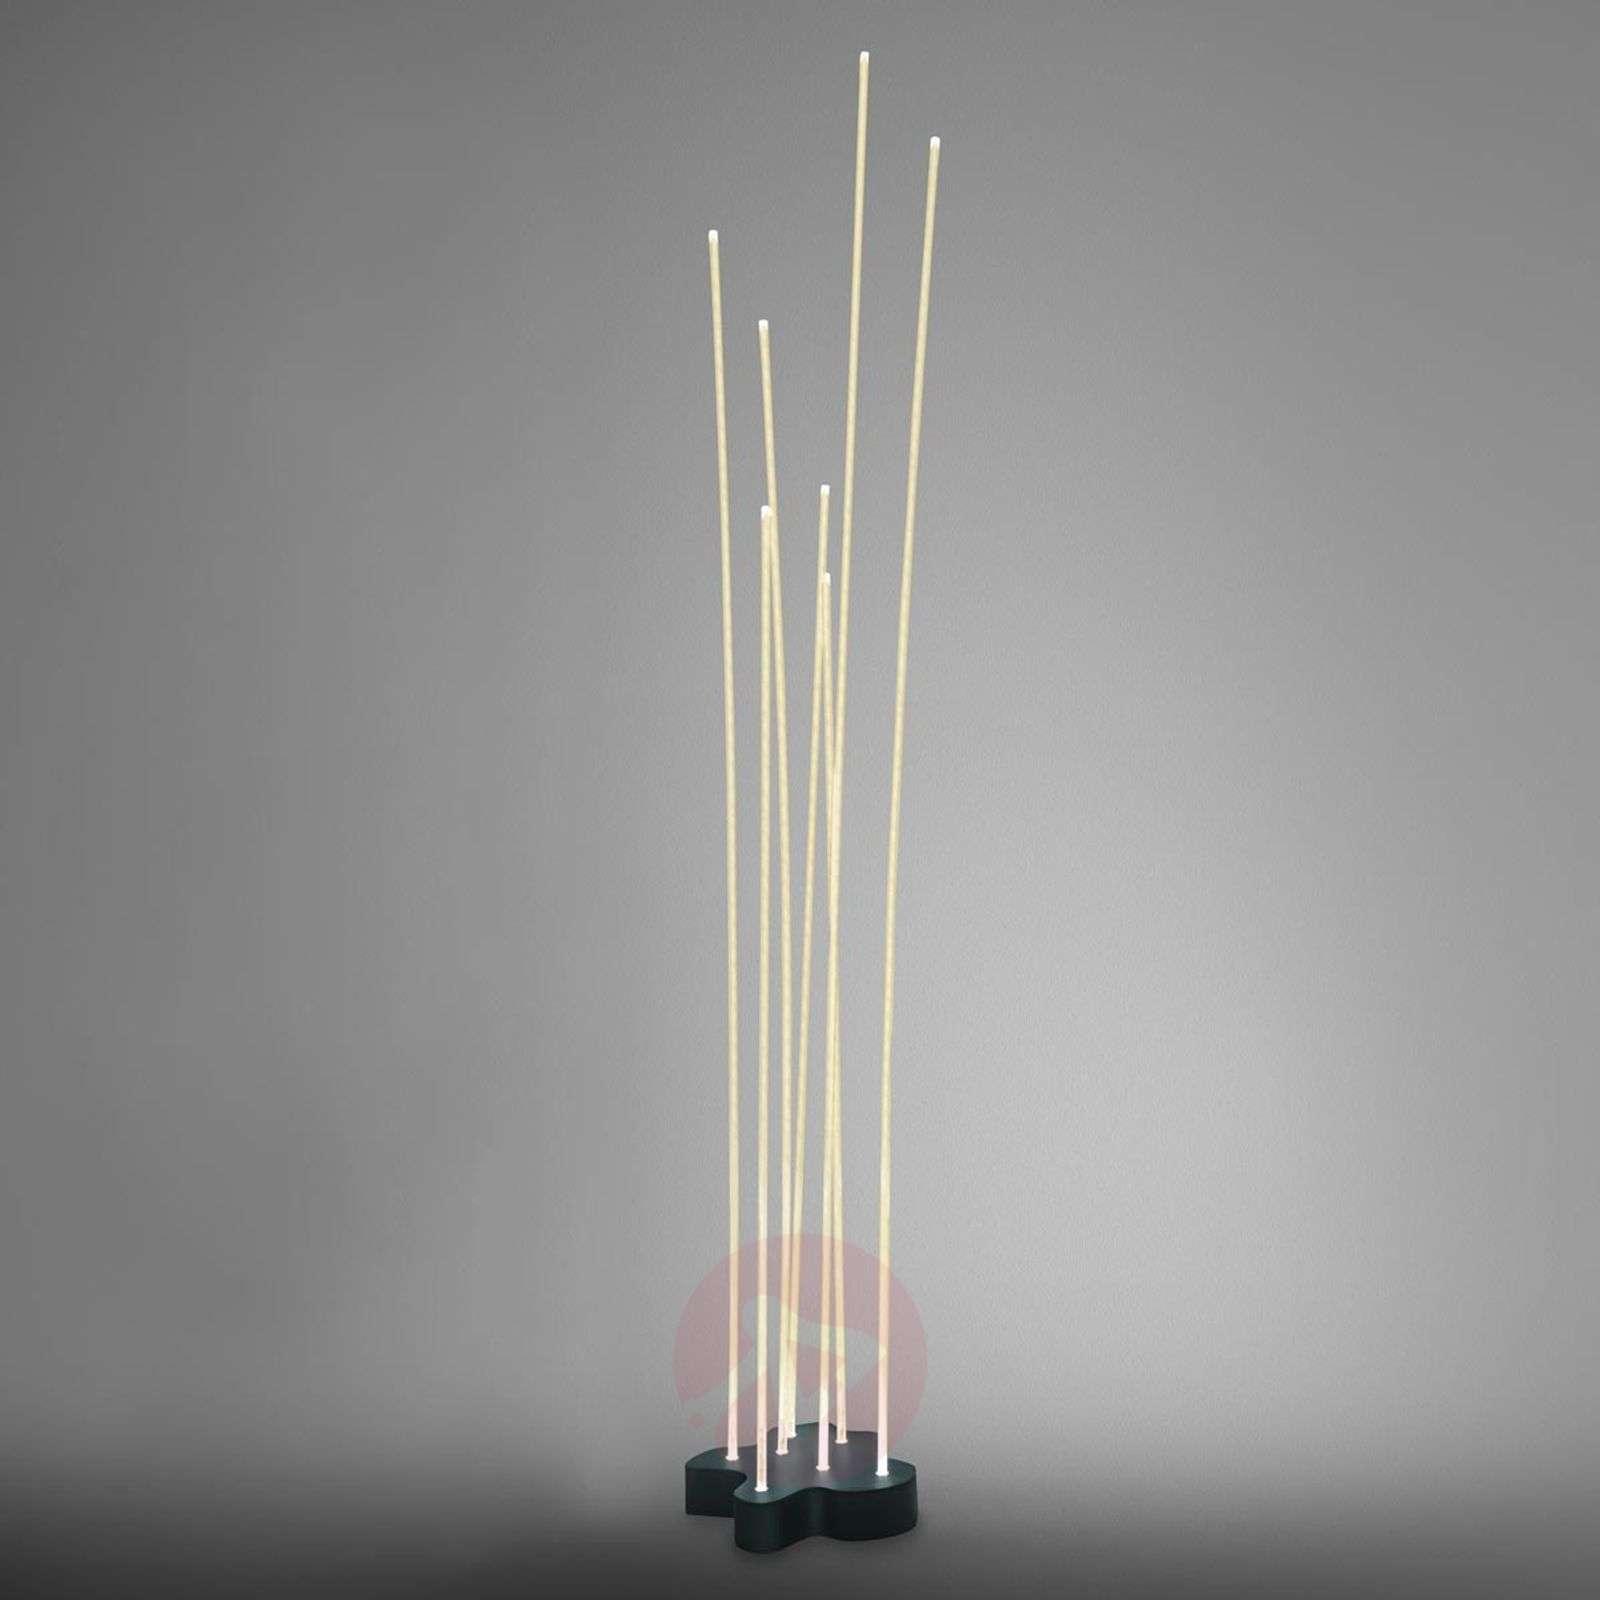 Reeds designer LED floor lamp-1060031-01